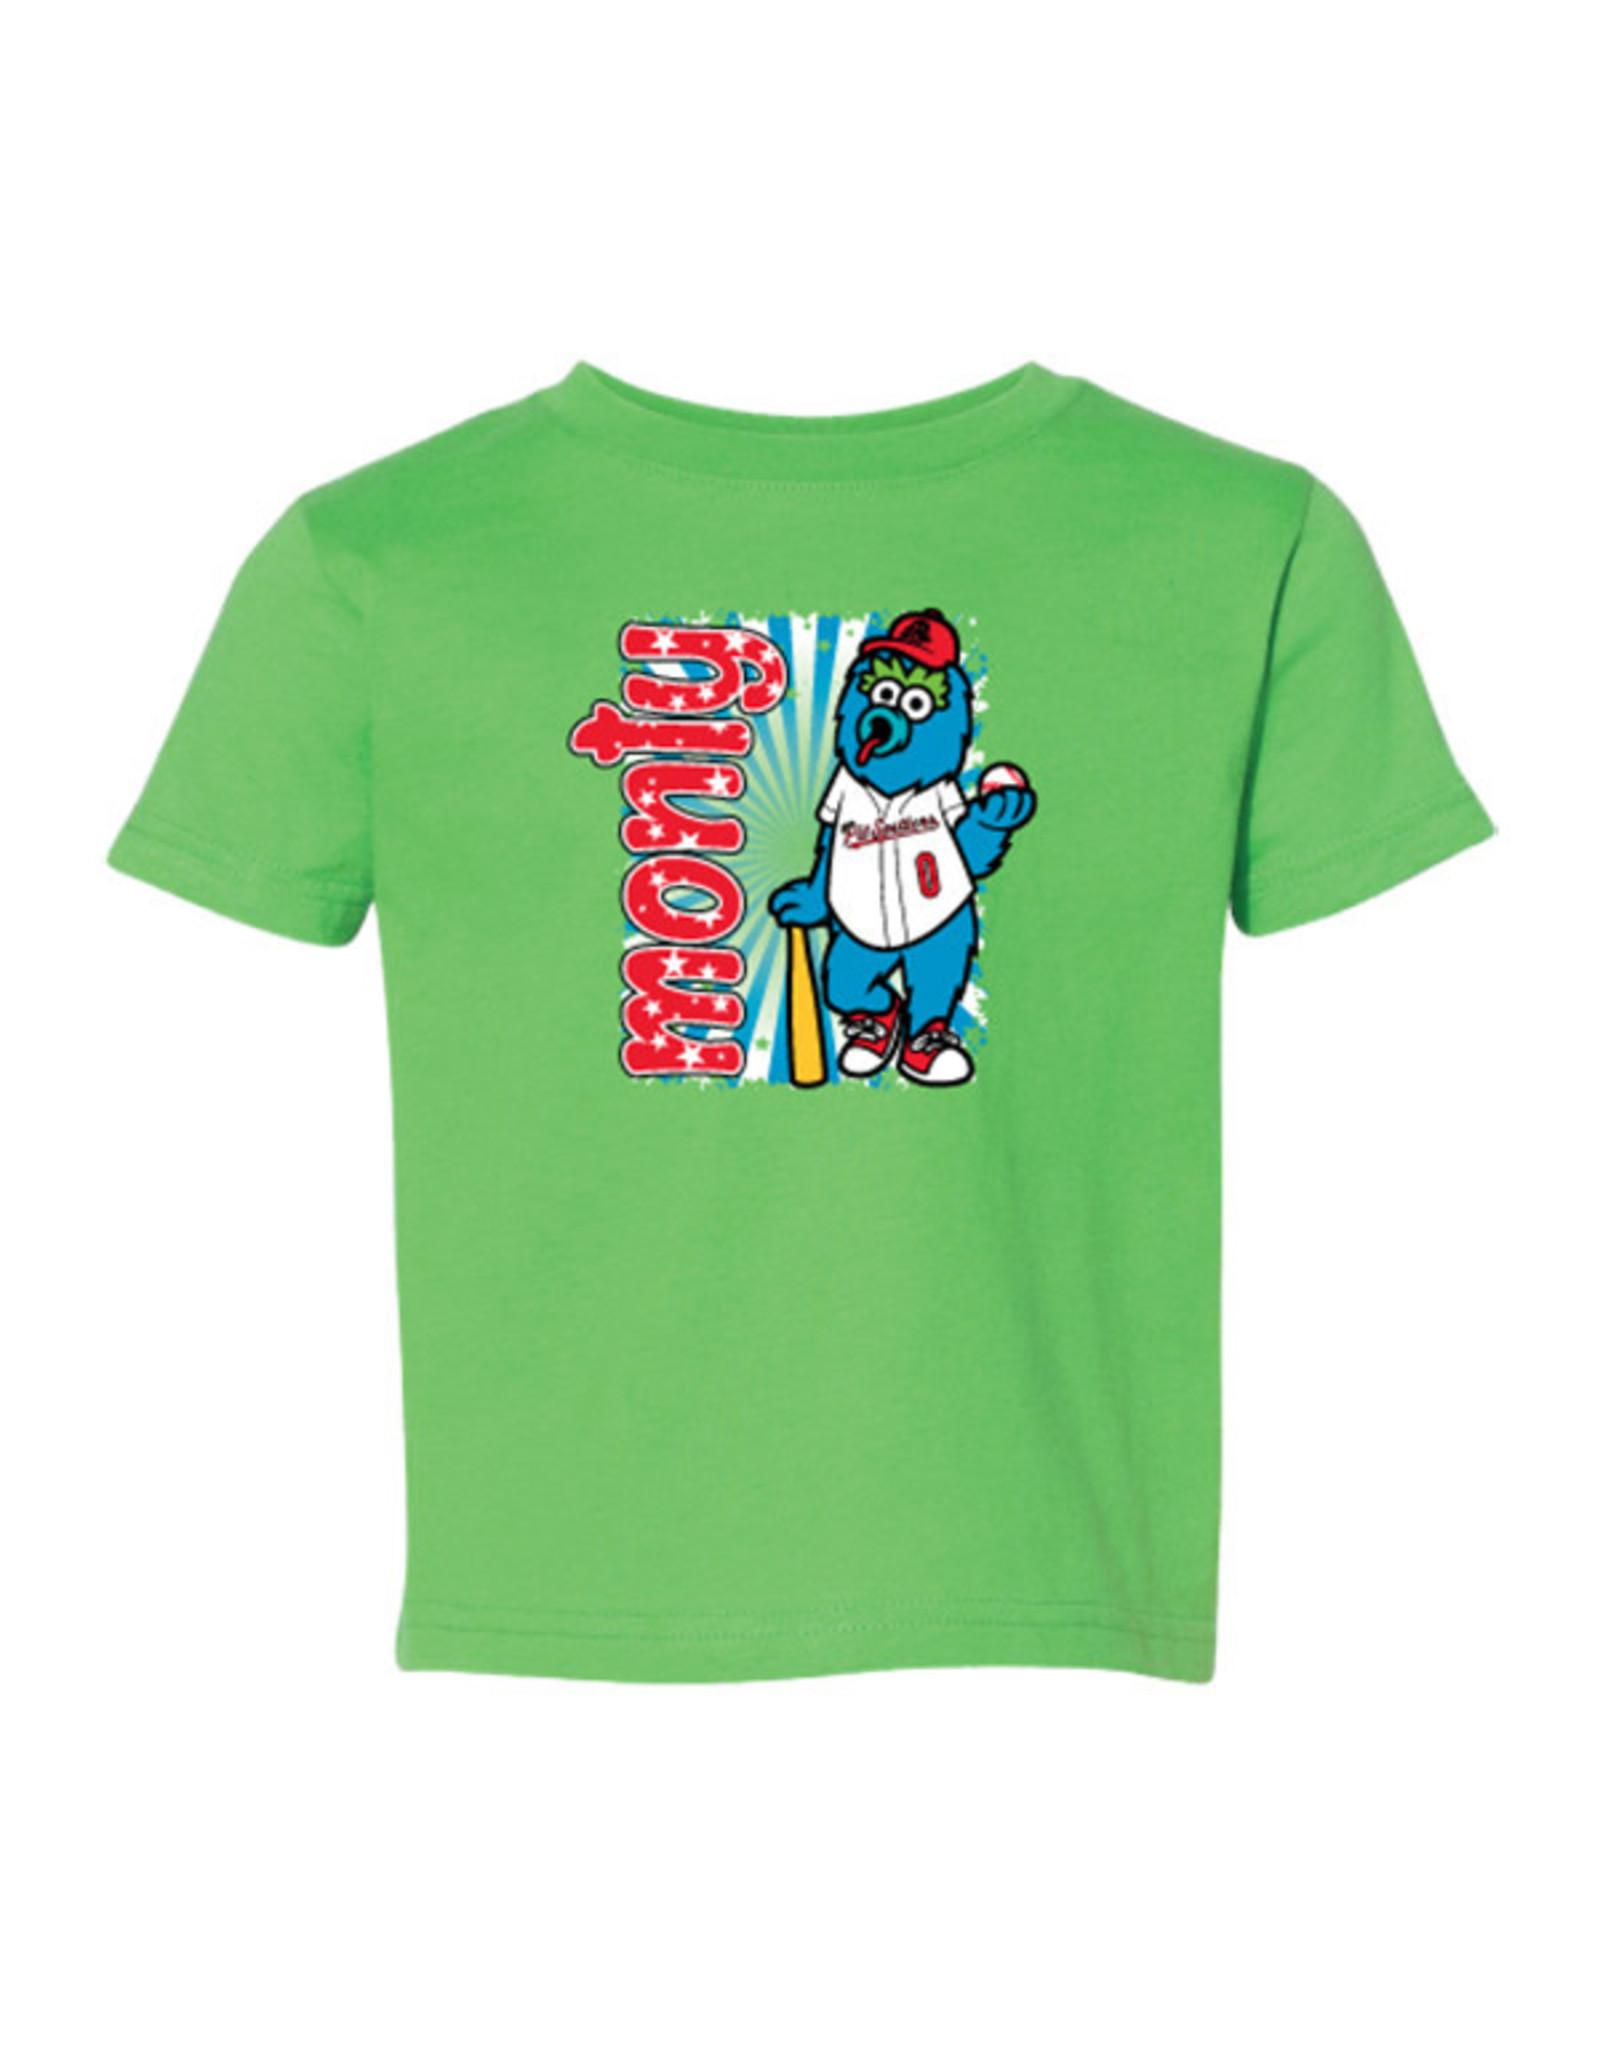 2910 Toddler Monty Mascot Green Tee